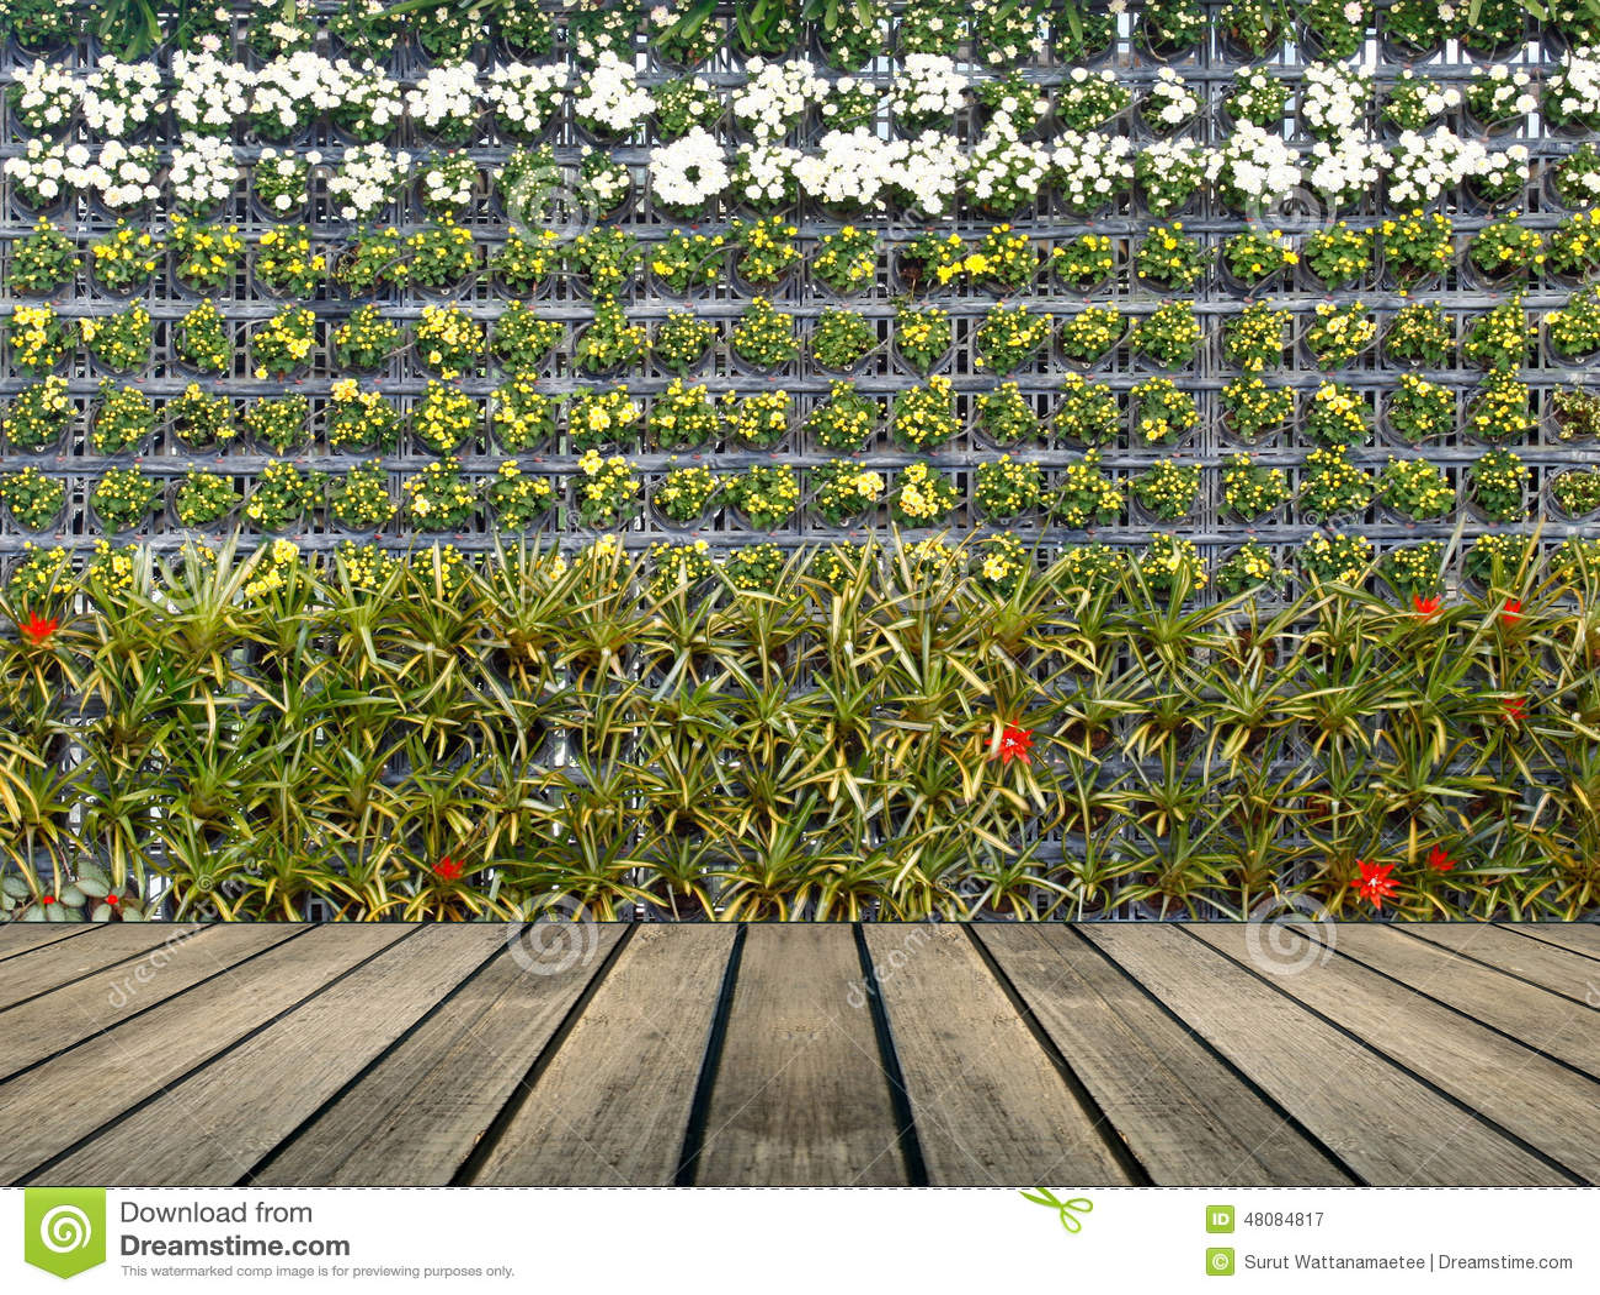 Flower Wall Vertical Garden Stock Photo Image 48084817